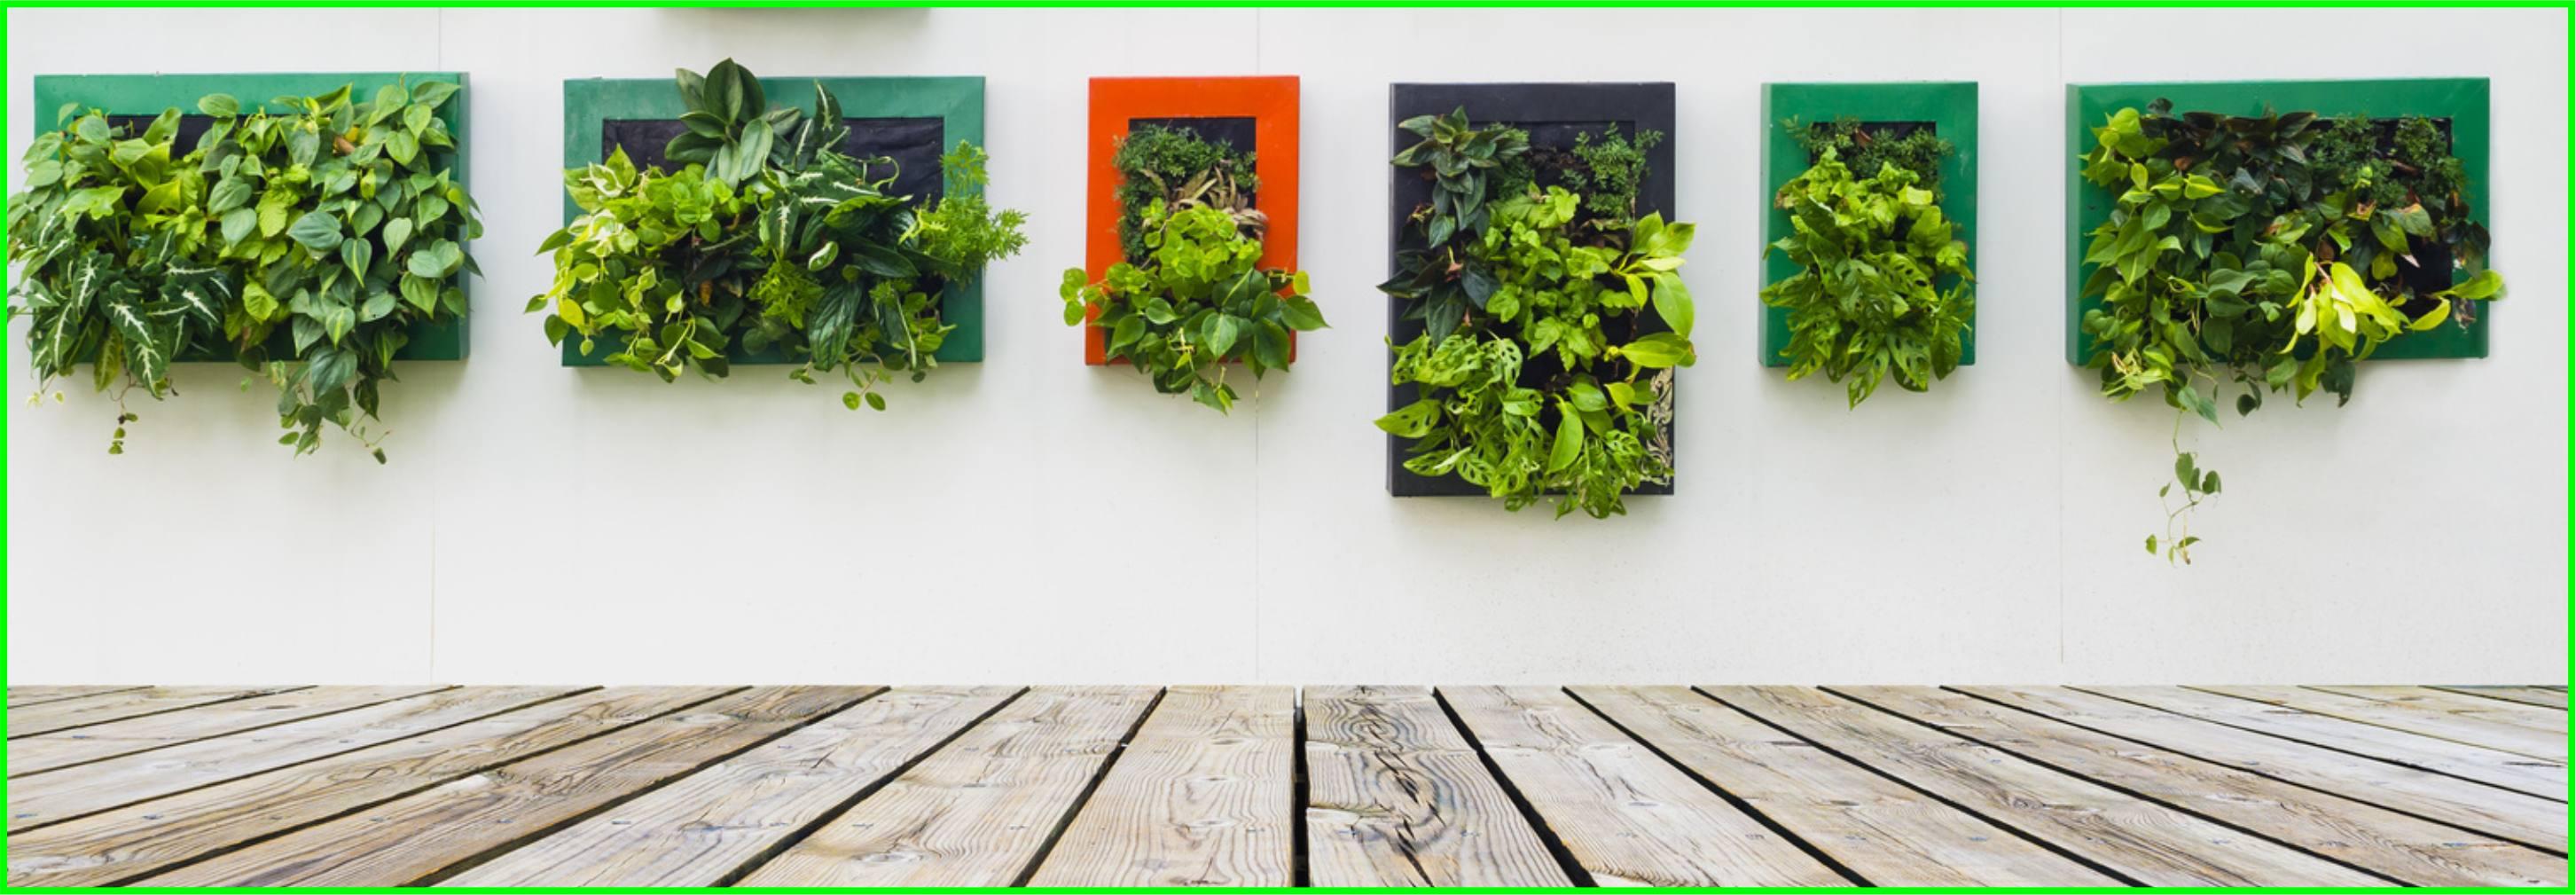 C mo hacer un huerto vertical parques alegres i a p for Historia de los jardines verticales